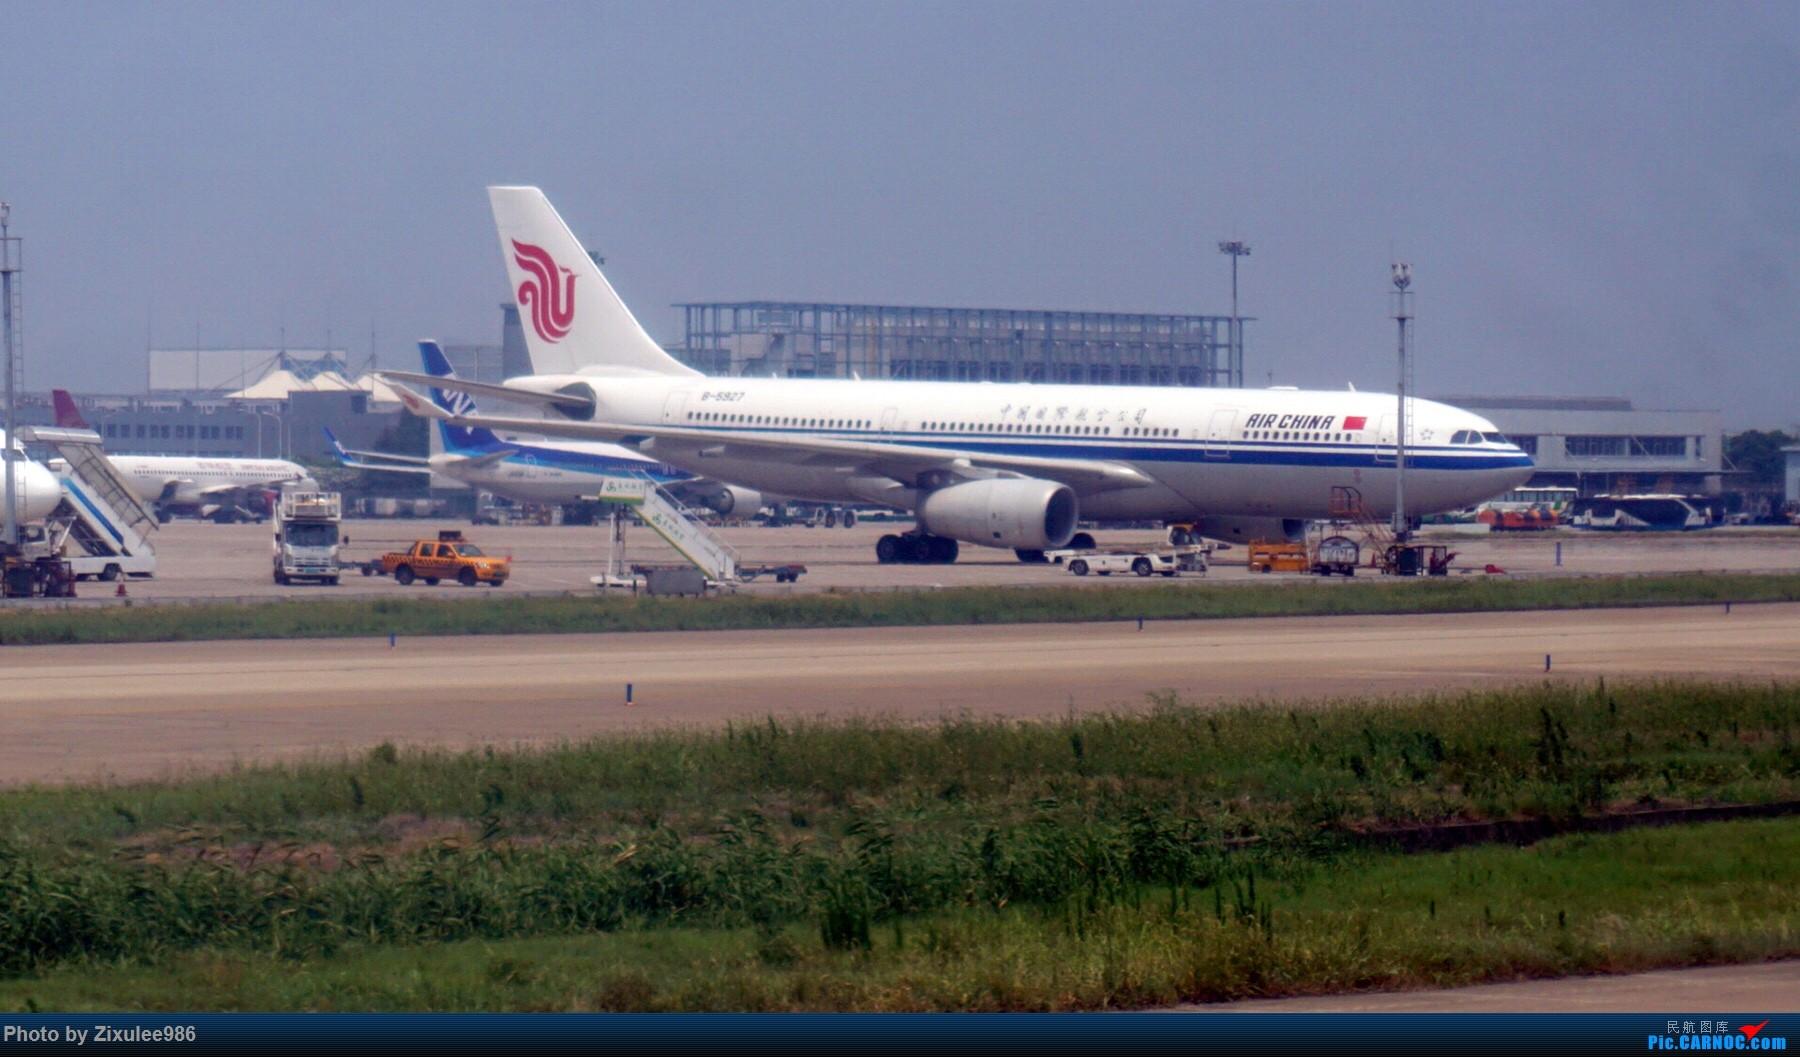 Re:[原创]加拿大21日游学之旅(一)~JJN-PVG-YYZ..(内含flightlog)~第一次发游记~多图缓更请谅解 AIRBUS A330-200 B-5927 中国上海浦东国际机场